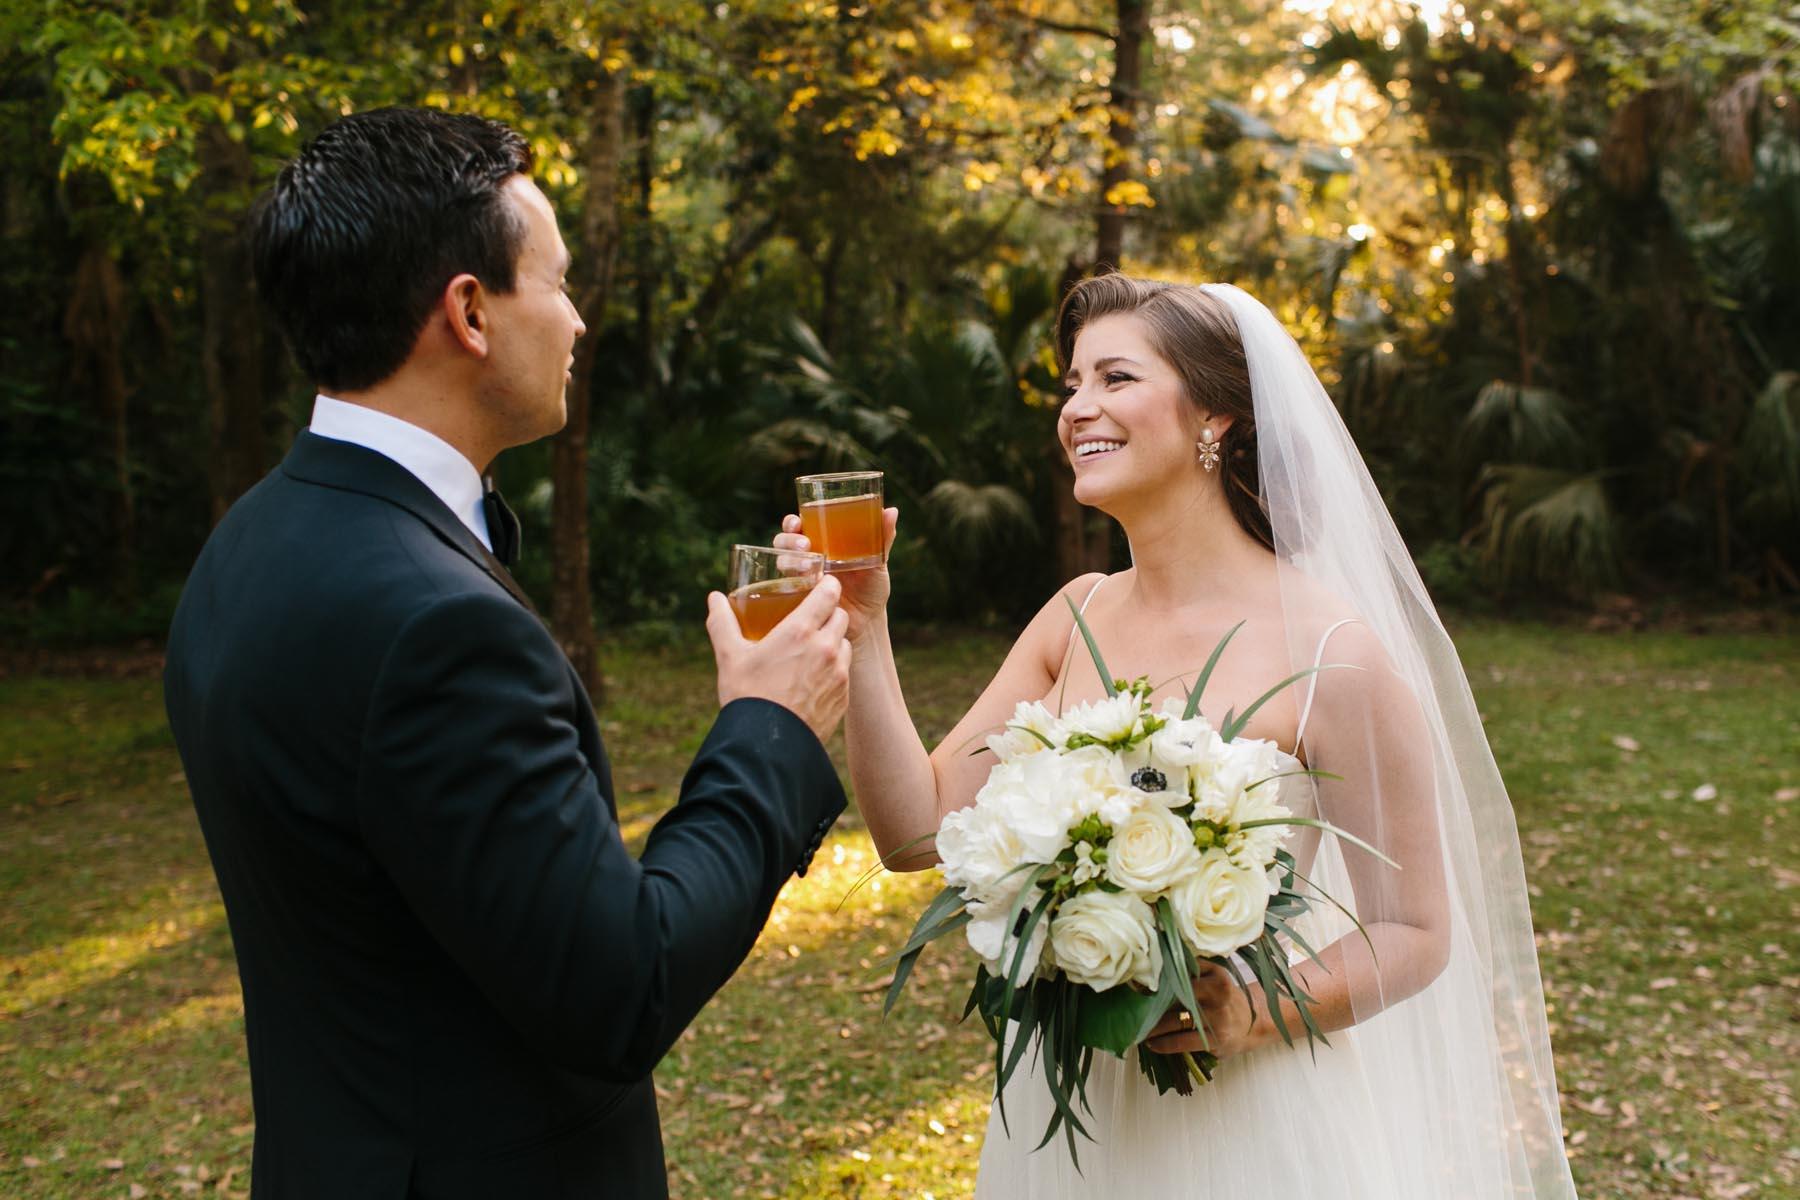 lowry wedding blog eden garden florida wedding-87